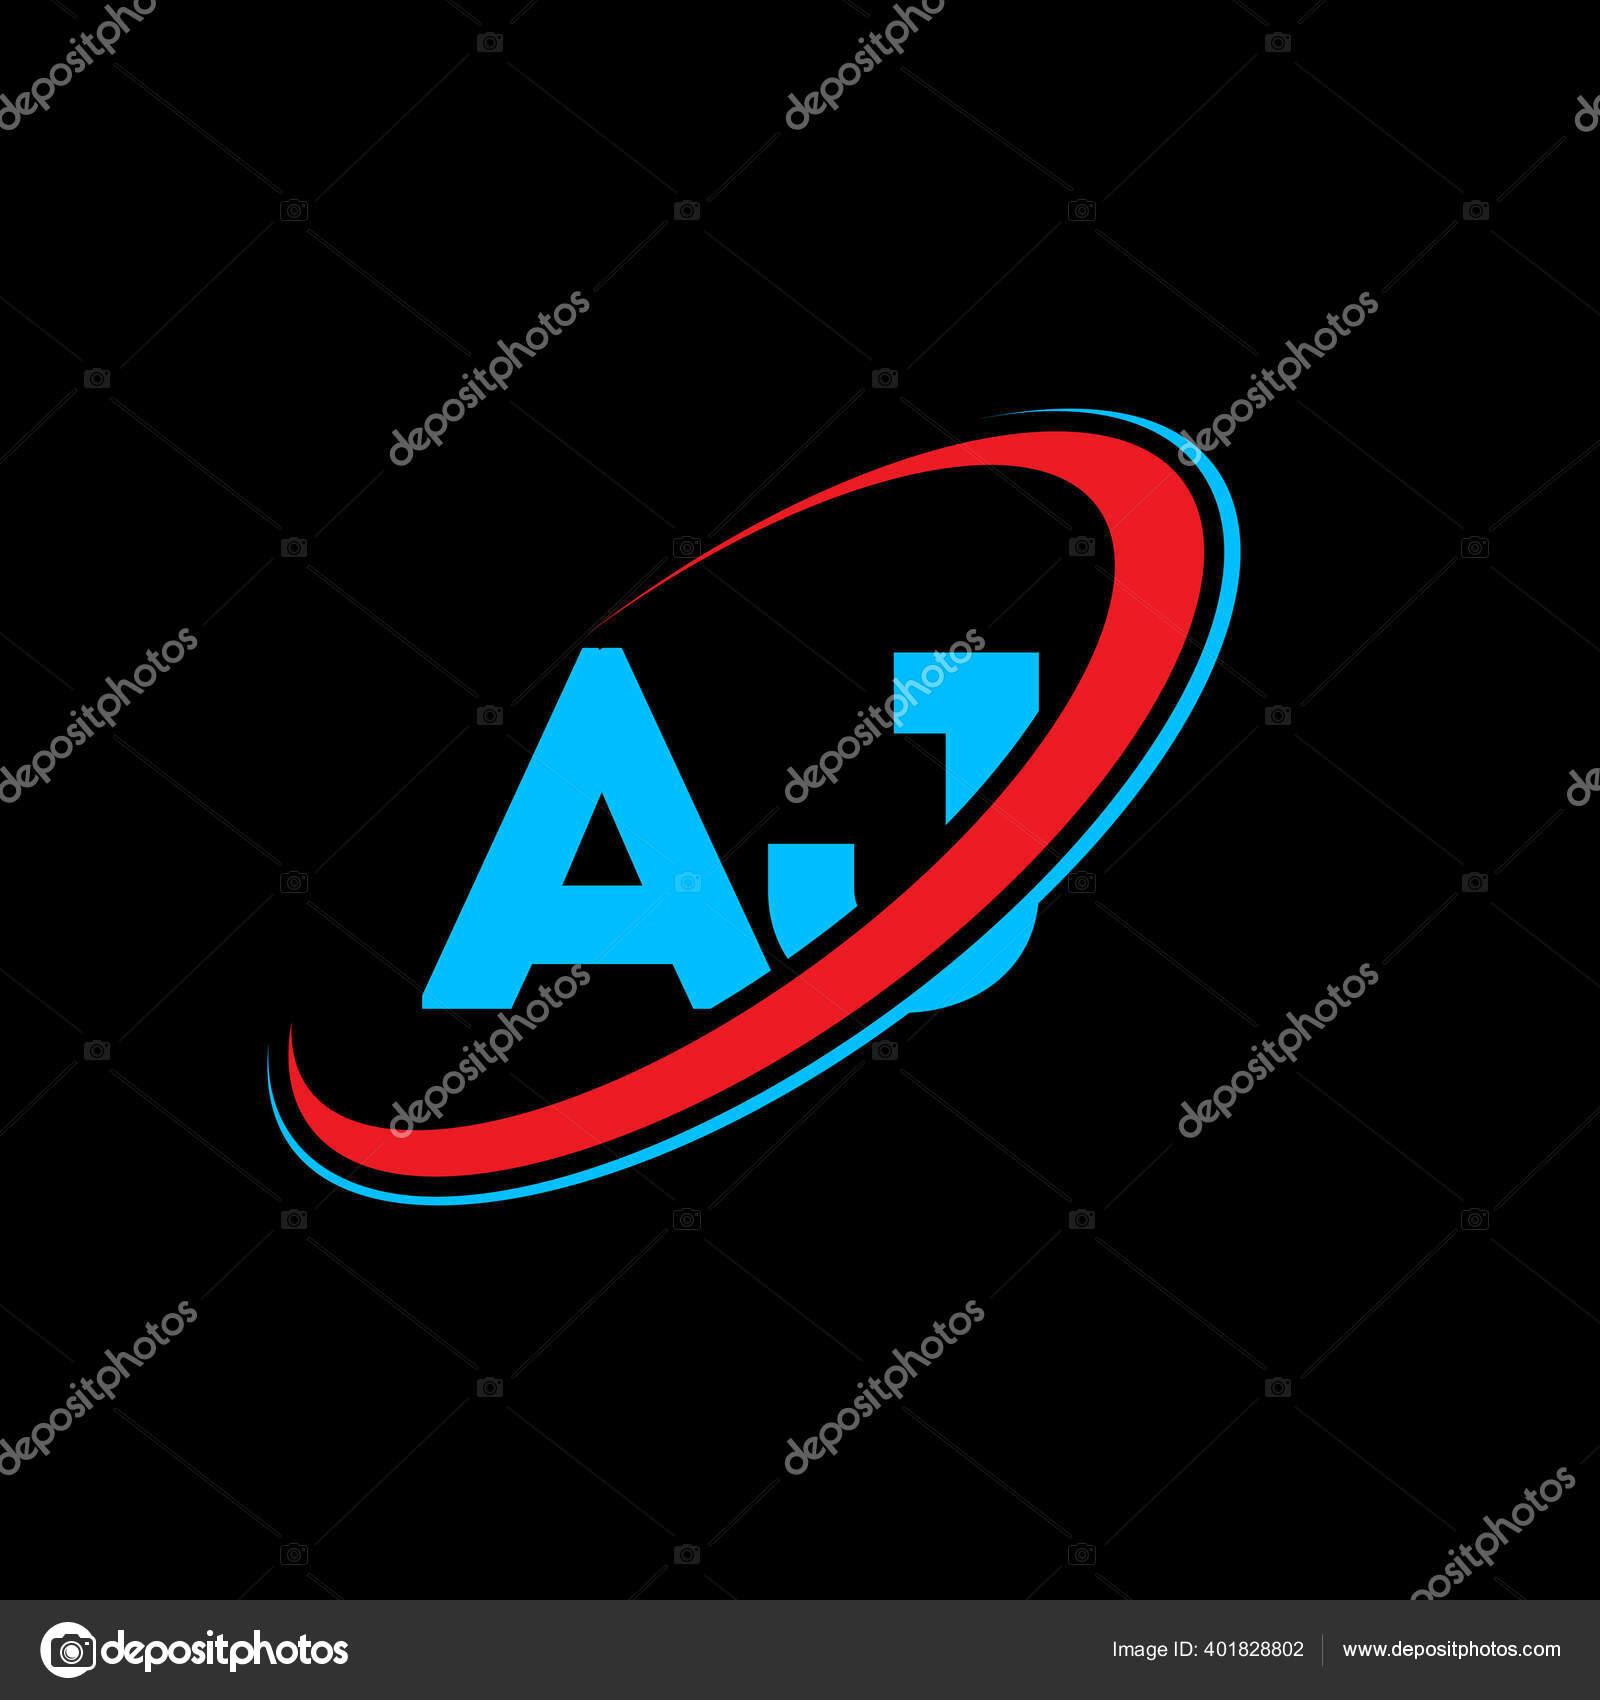 Vektorgrafiken Diseño del logo aj Vektorbilder Diseño del logo aj ...